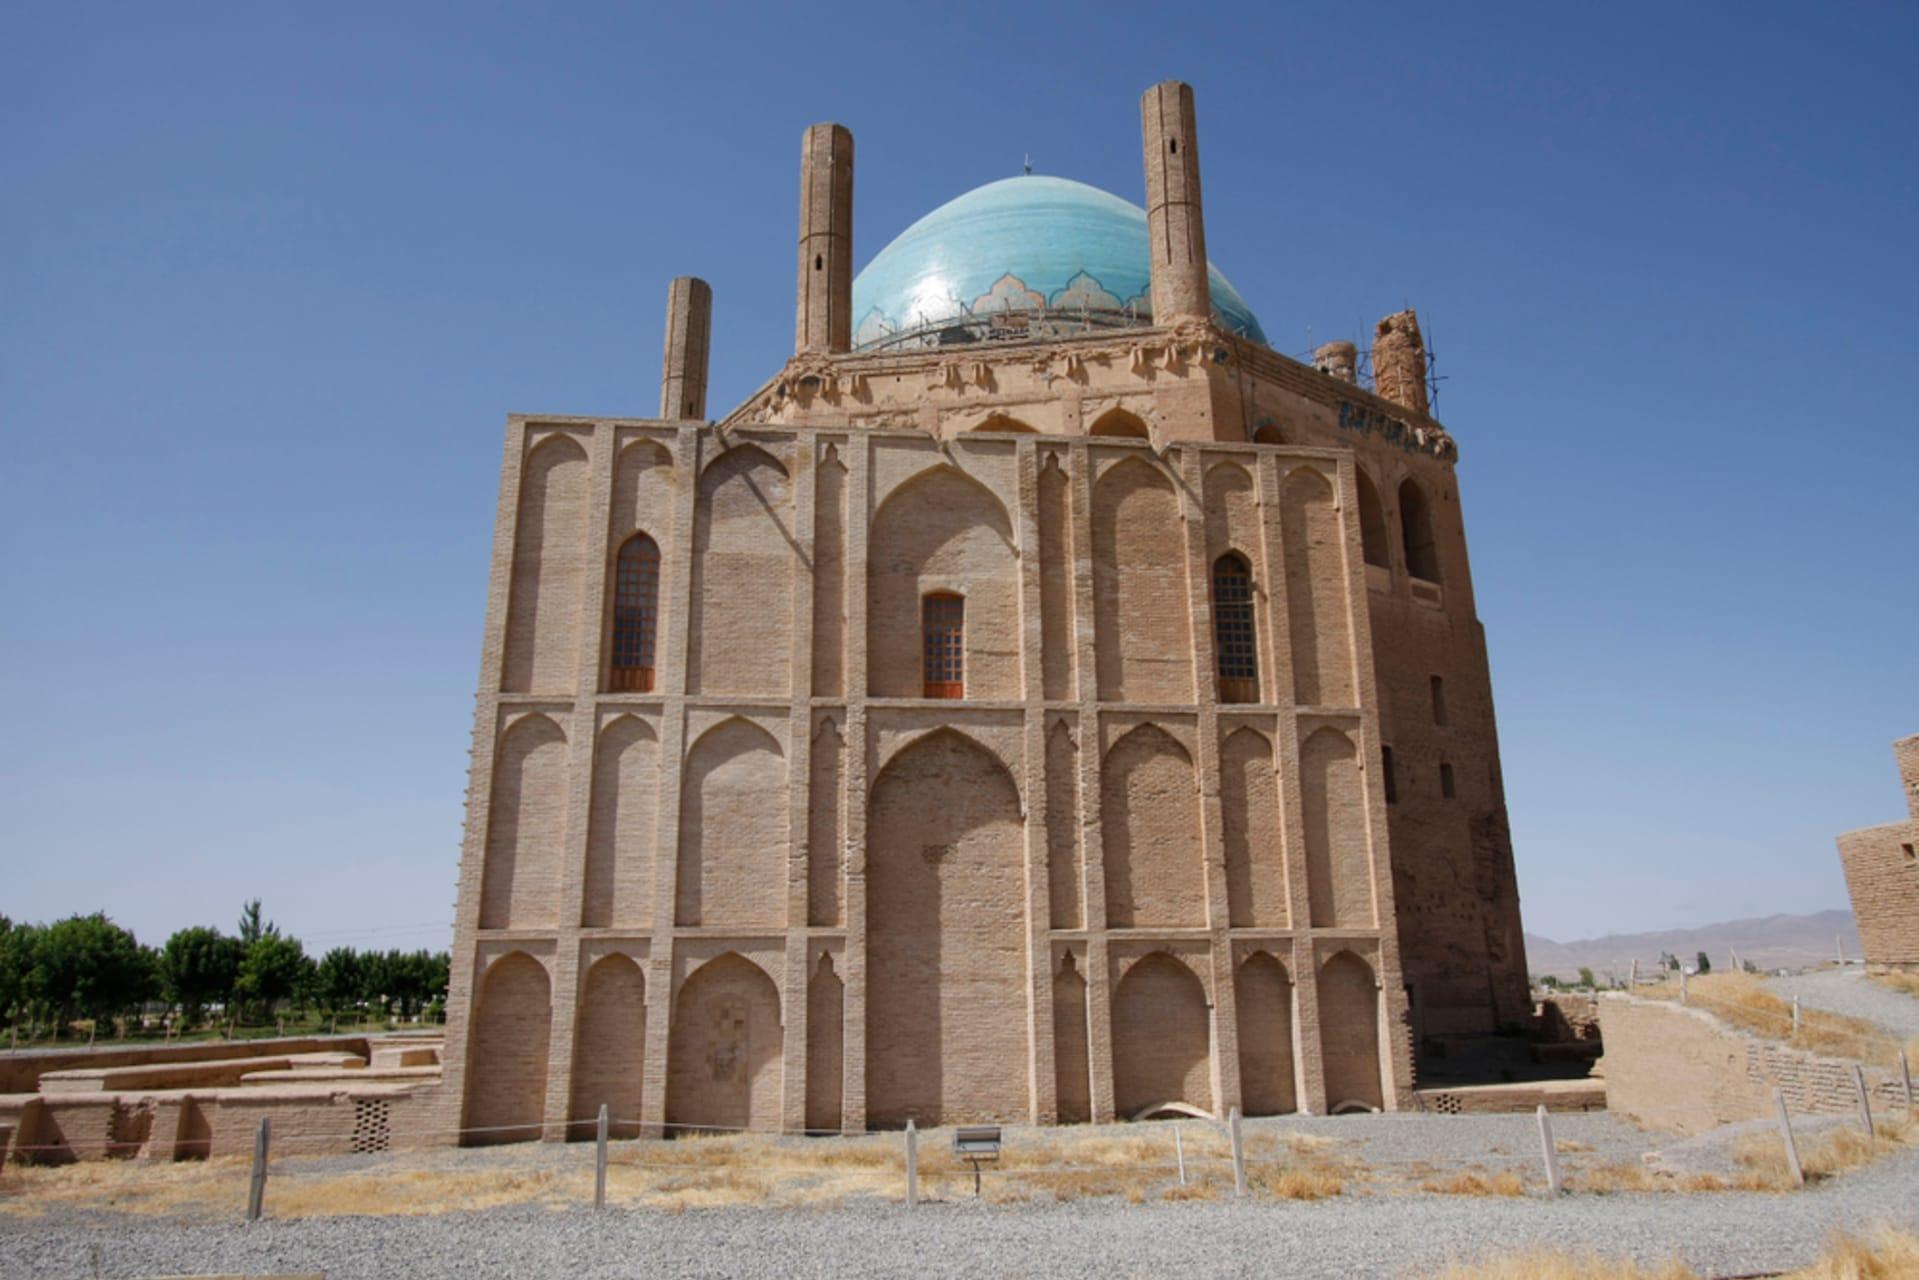 Zanjan - World Heritage site: Mausoleum of Oljeitu (Gonbad-e Soltaniyeh)